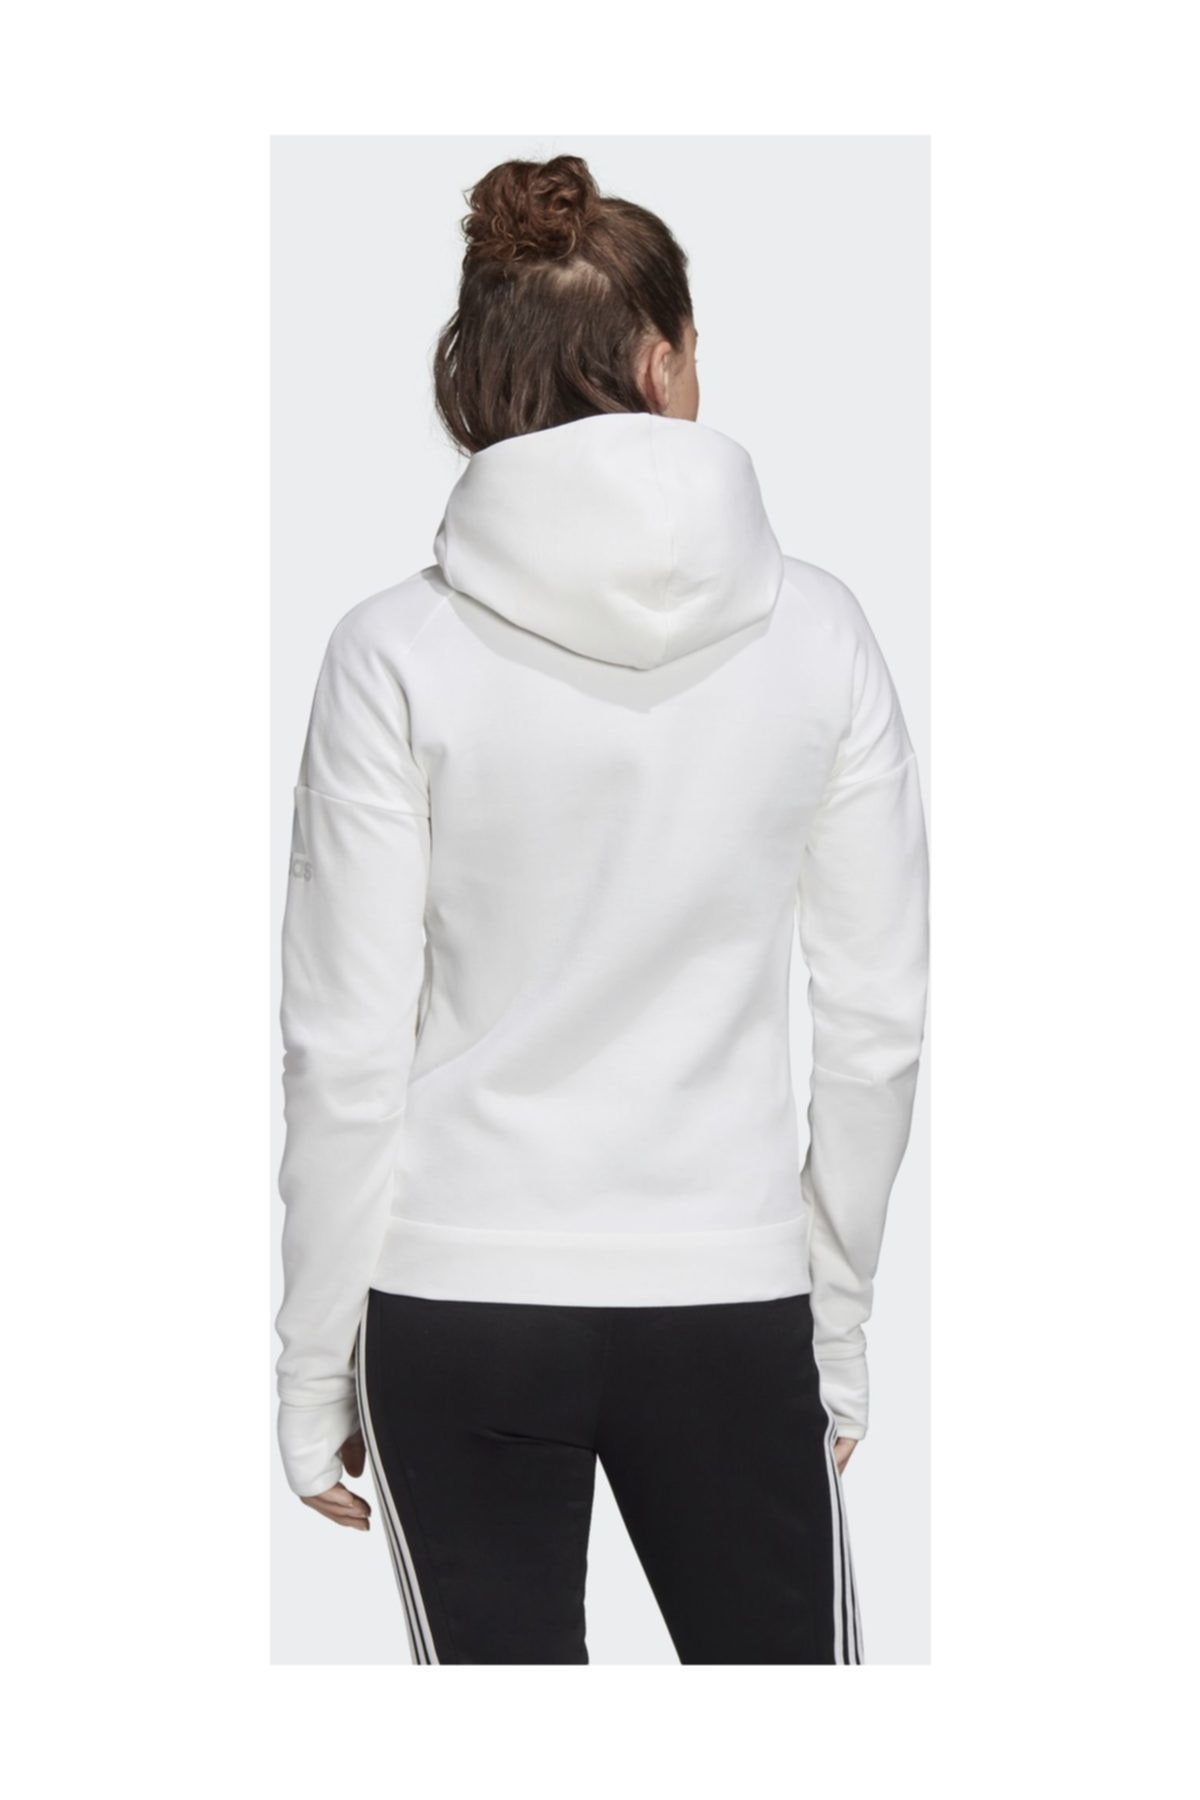 adidas Z.n.e. Hoodie Kadın Sweatshirt 2